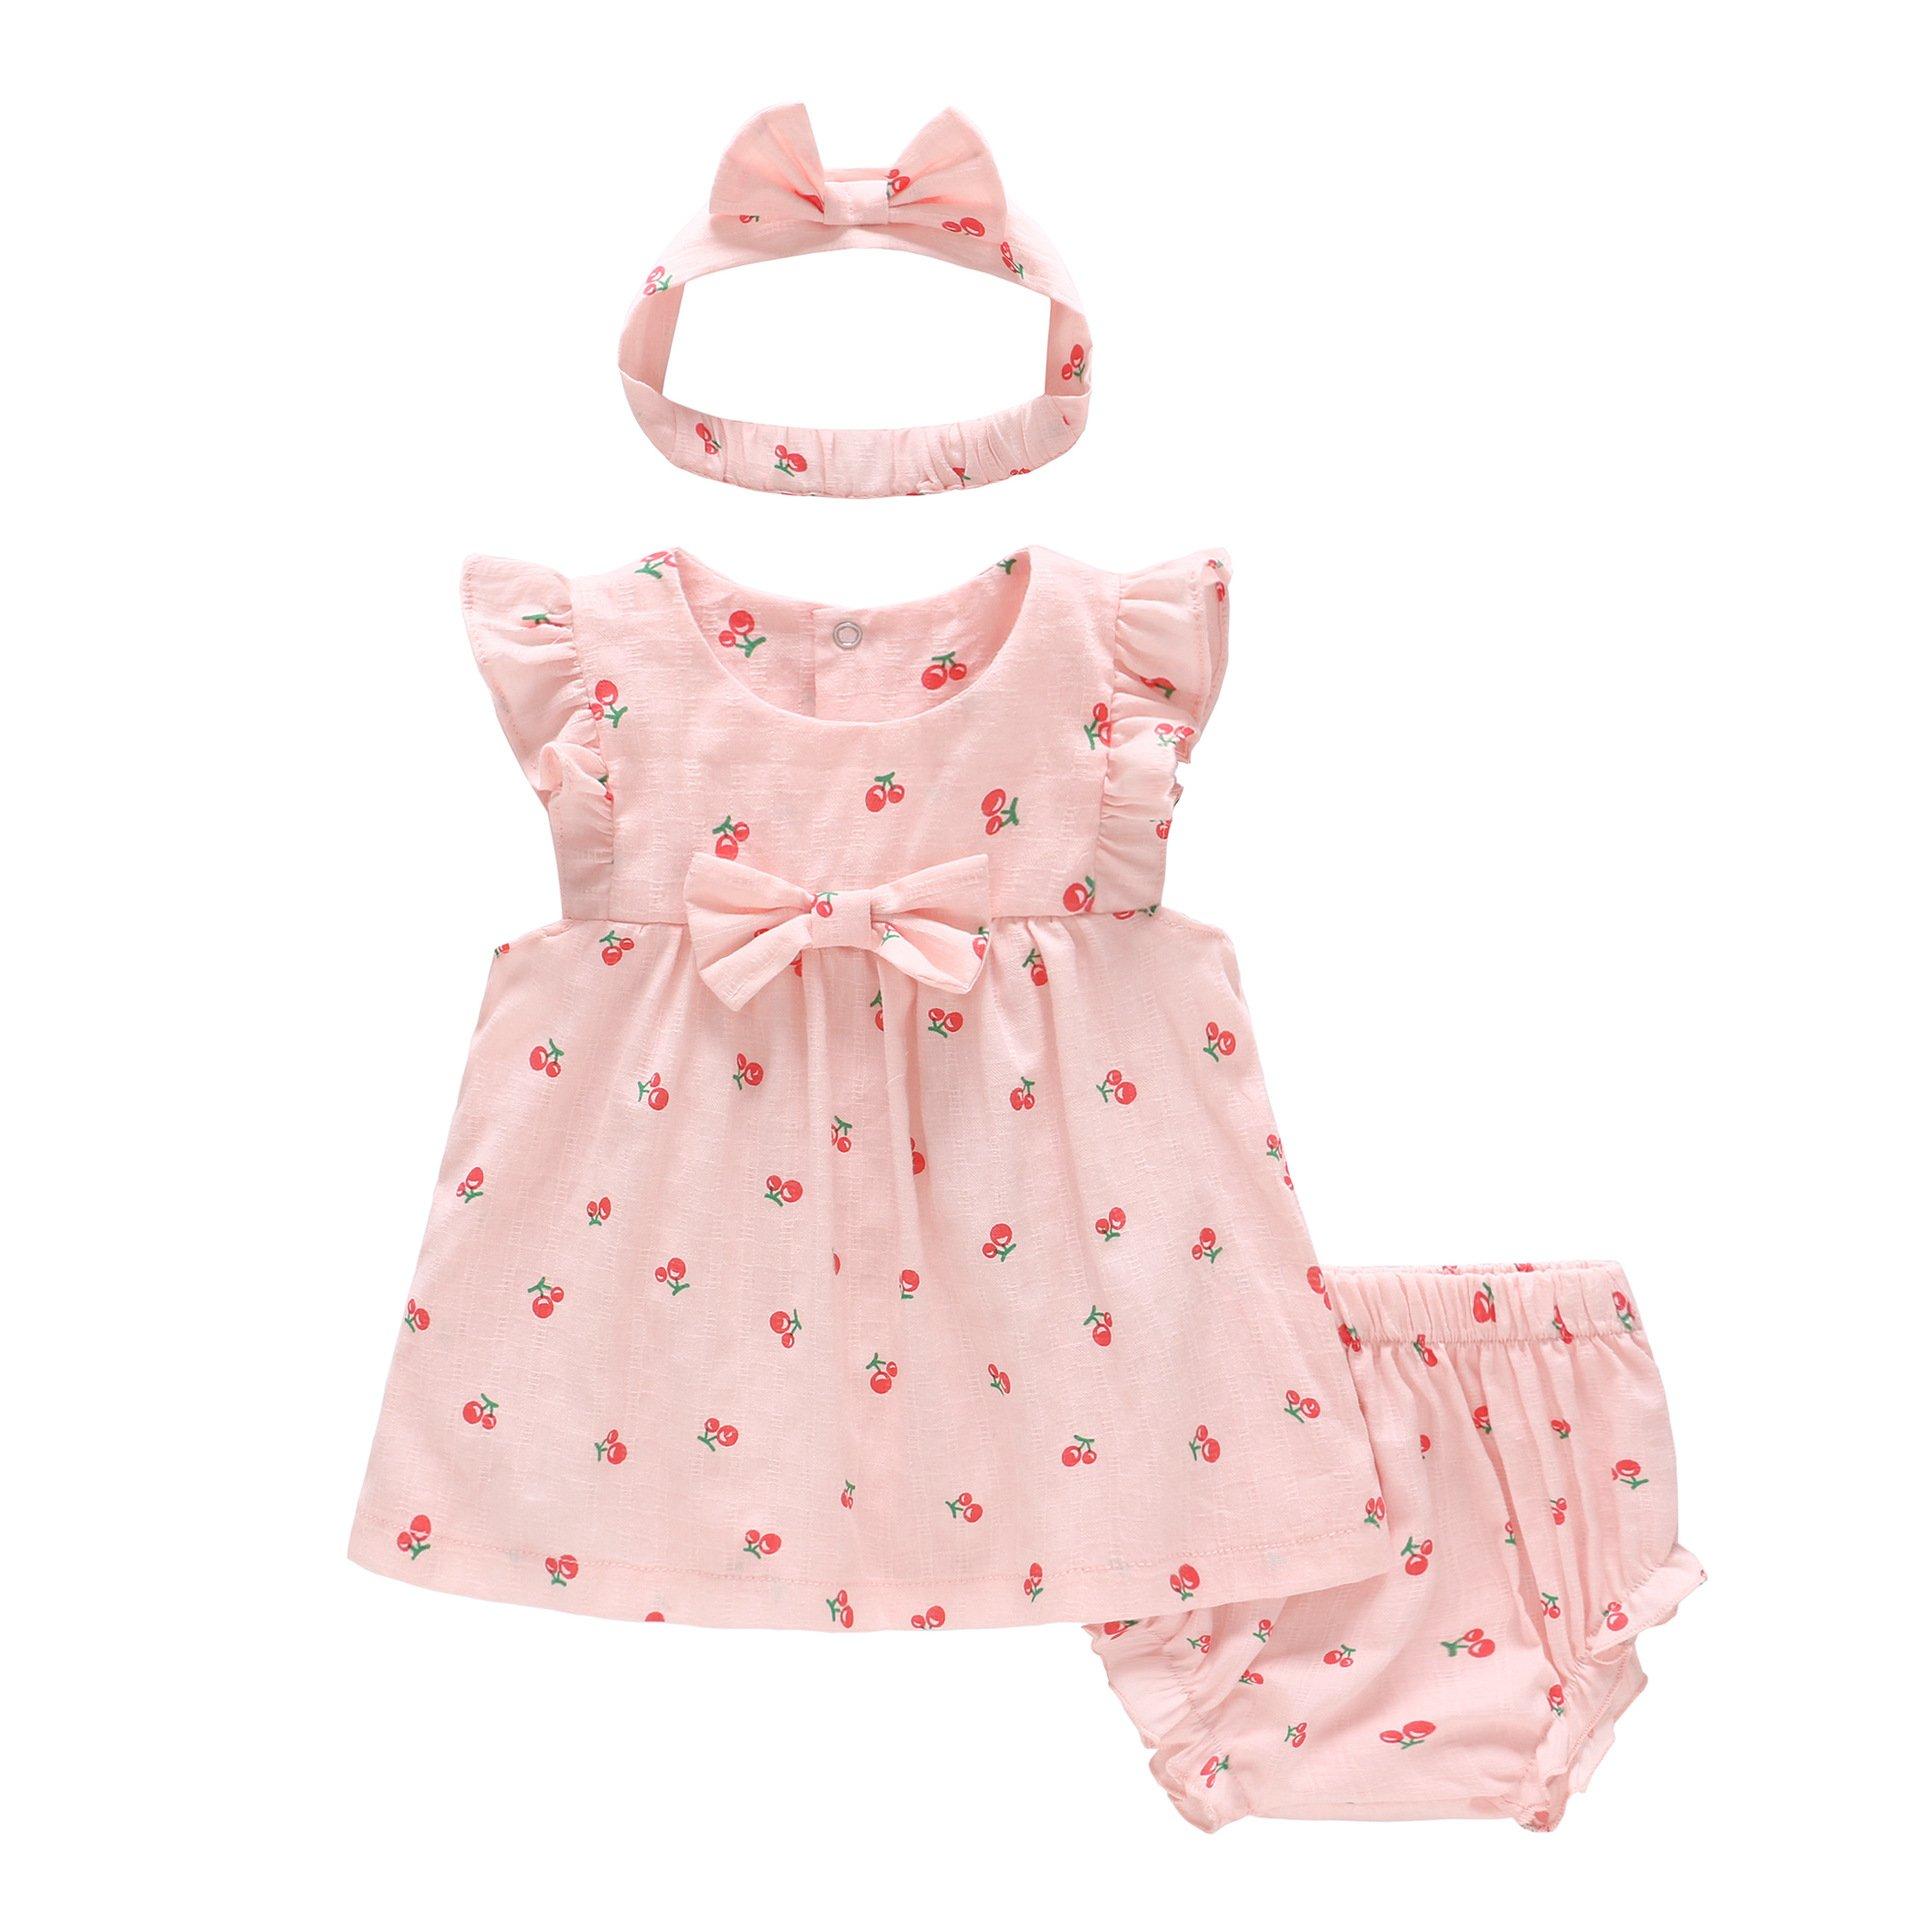 eb91d989e3aba Feidoog Baby Clothes Romper Shorts Headband Top and Bottom 3 Piece Set  Newborn Baby Girl Princess Ribbon Ruffle Cute Dress Cotton Baby Shower  Birthday ...